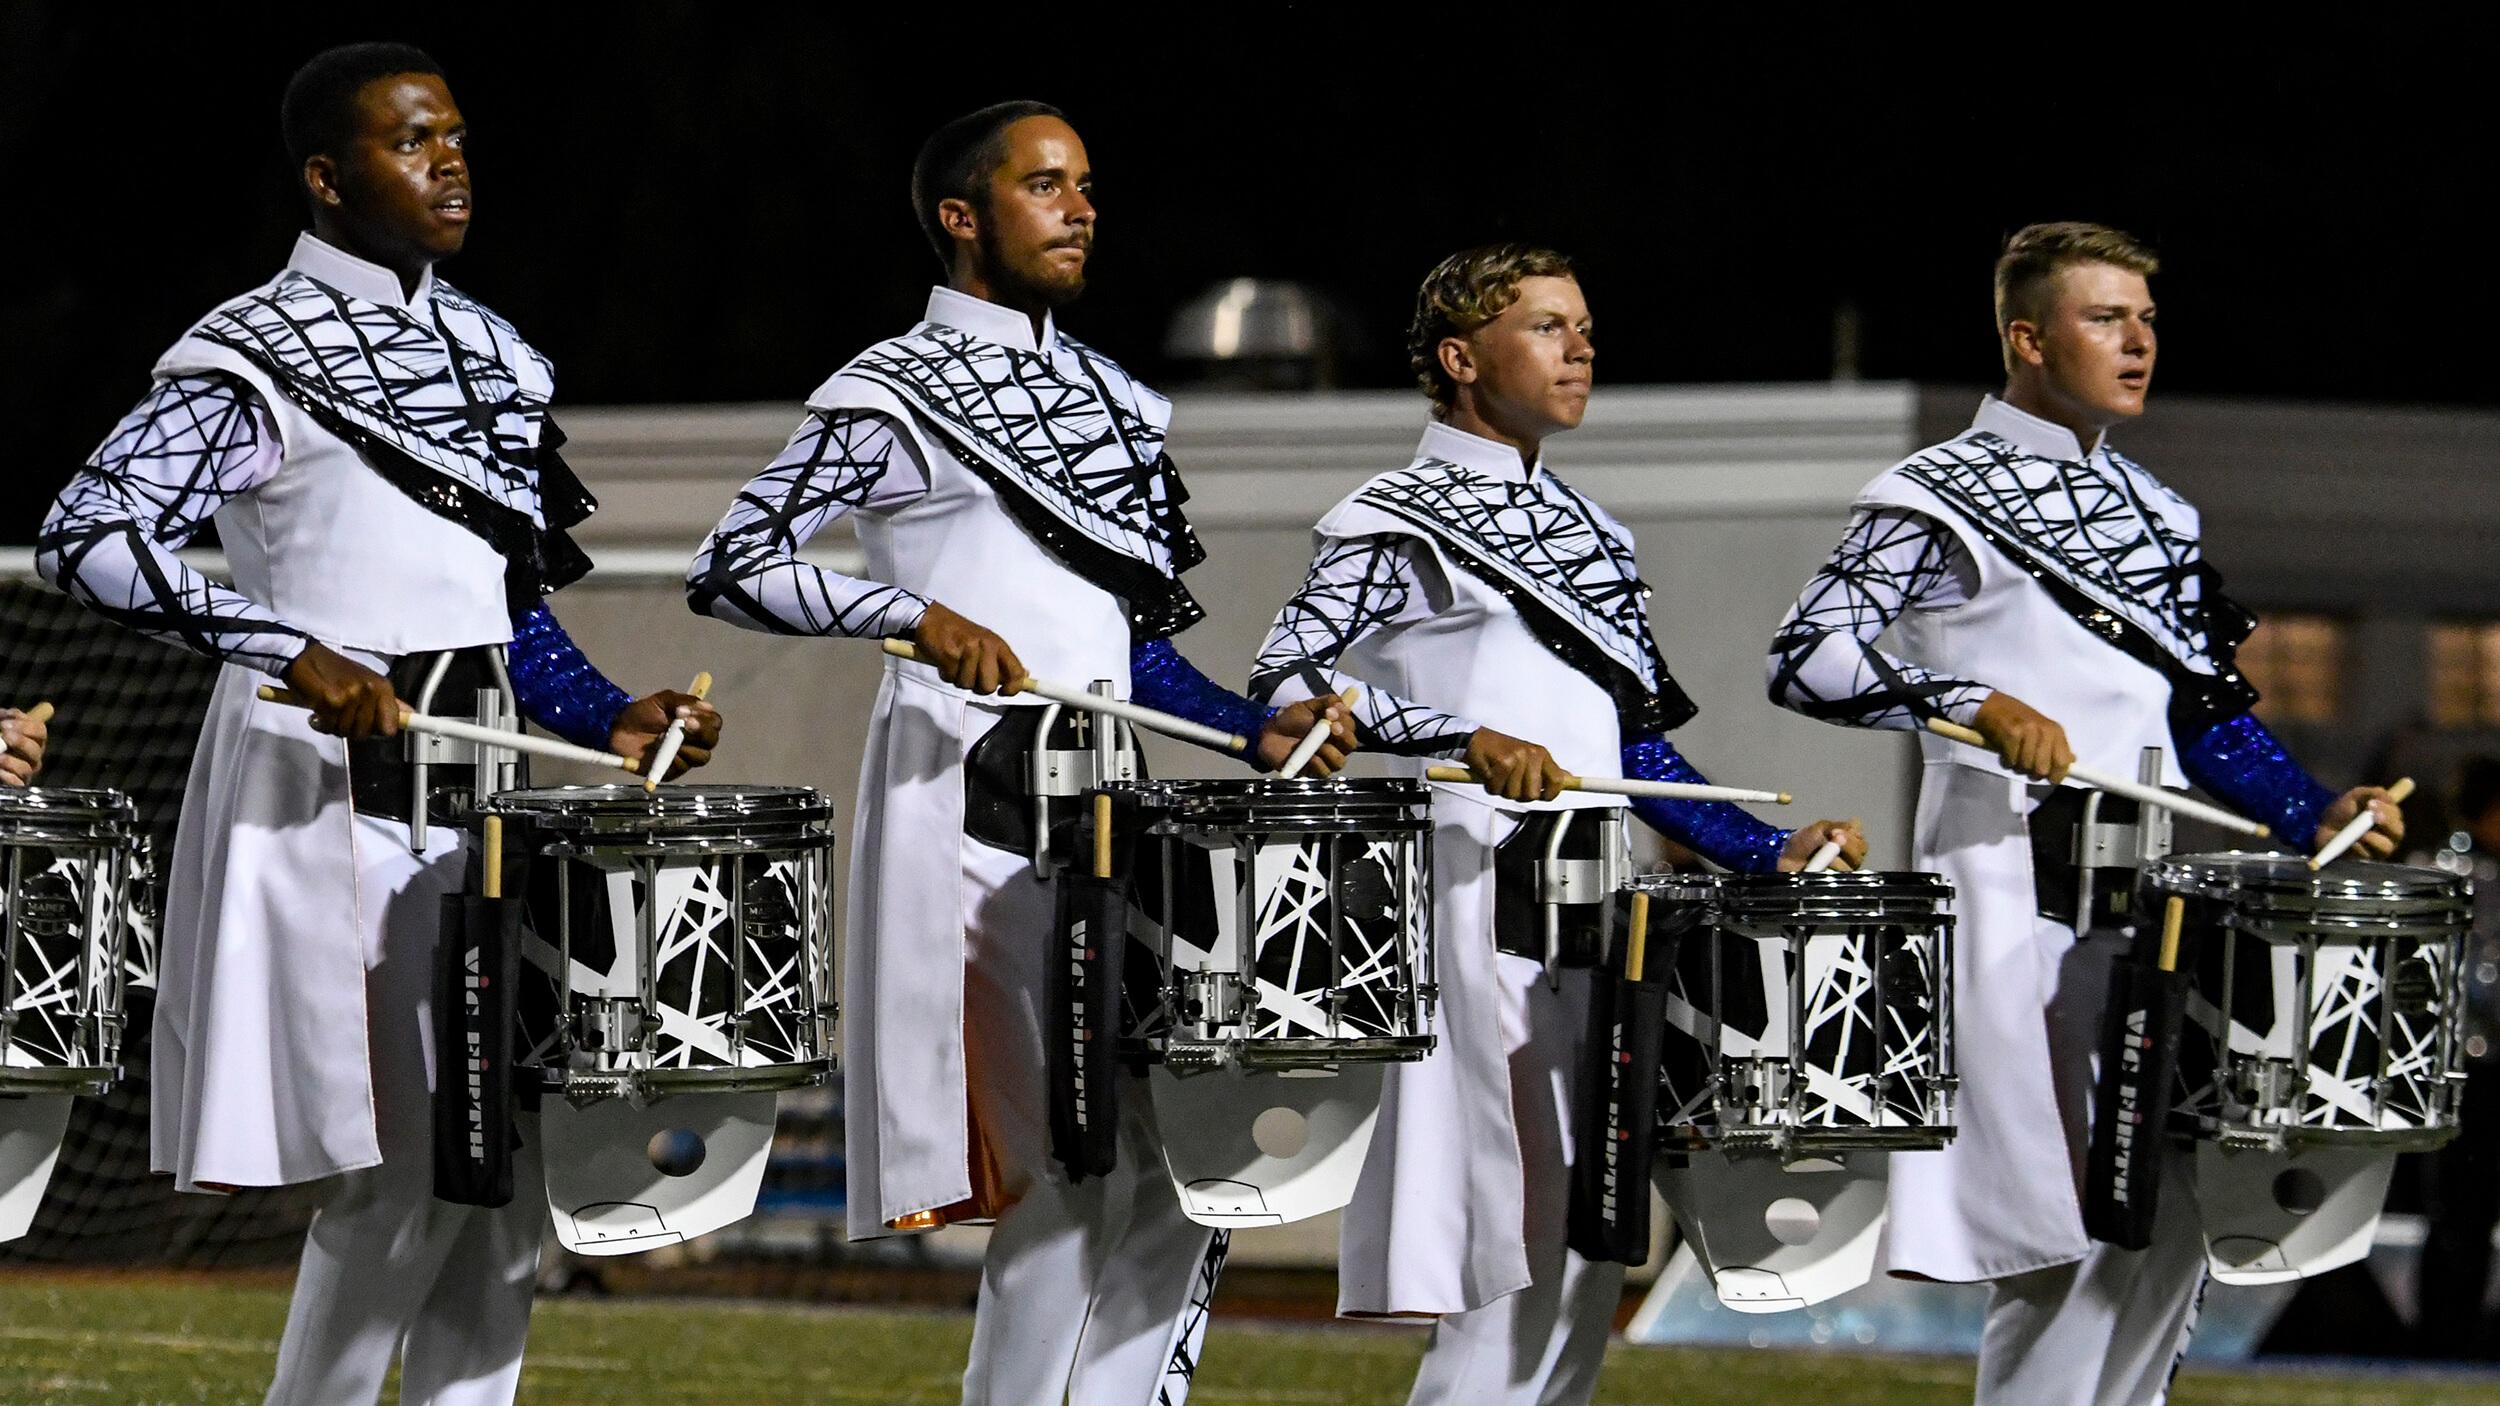 Drums Across the Desert